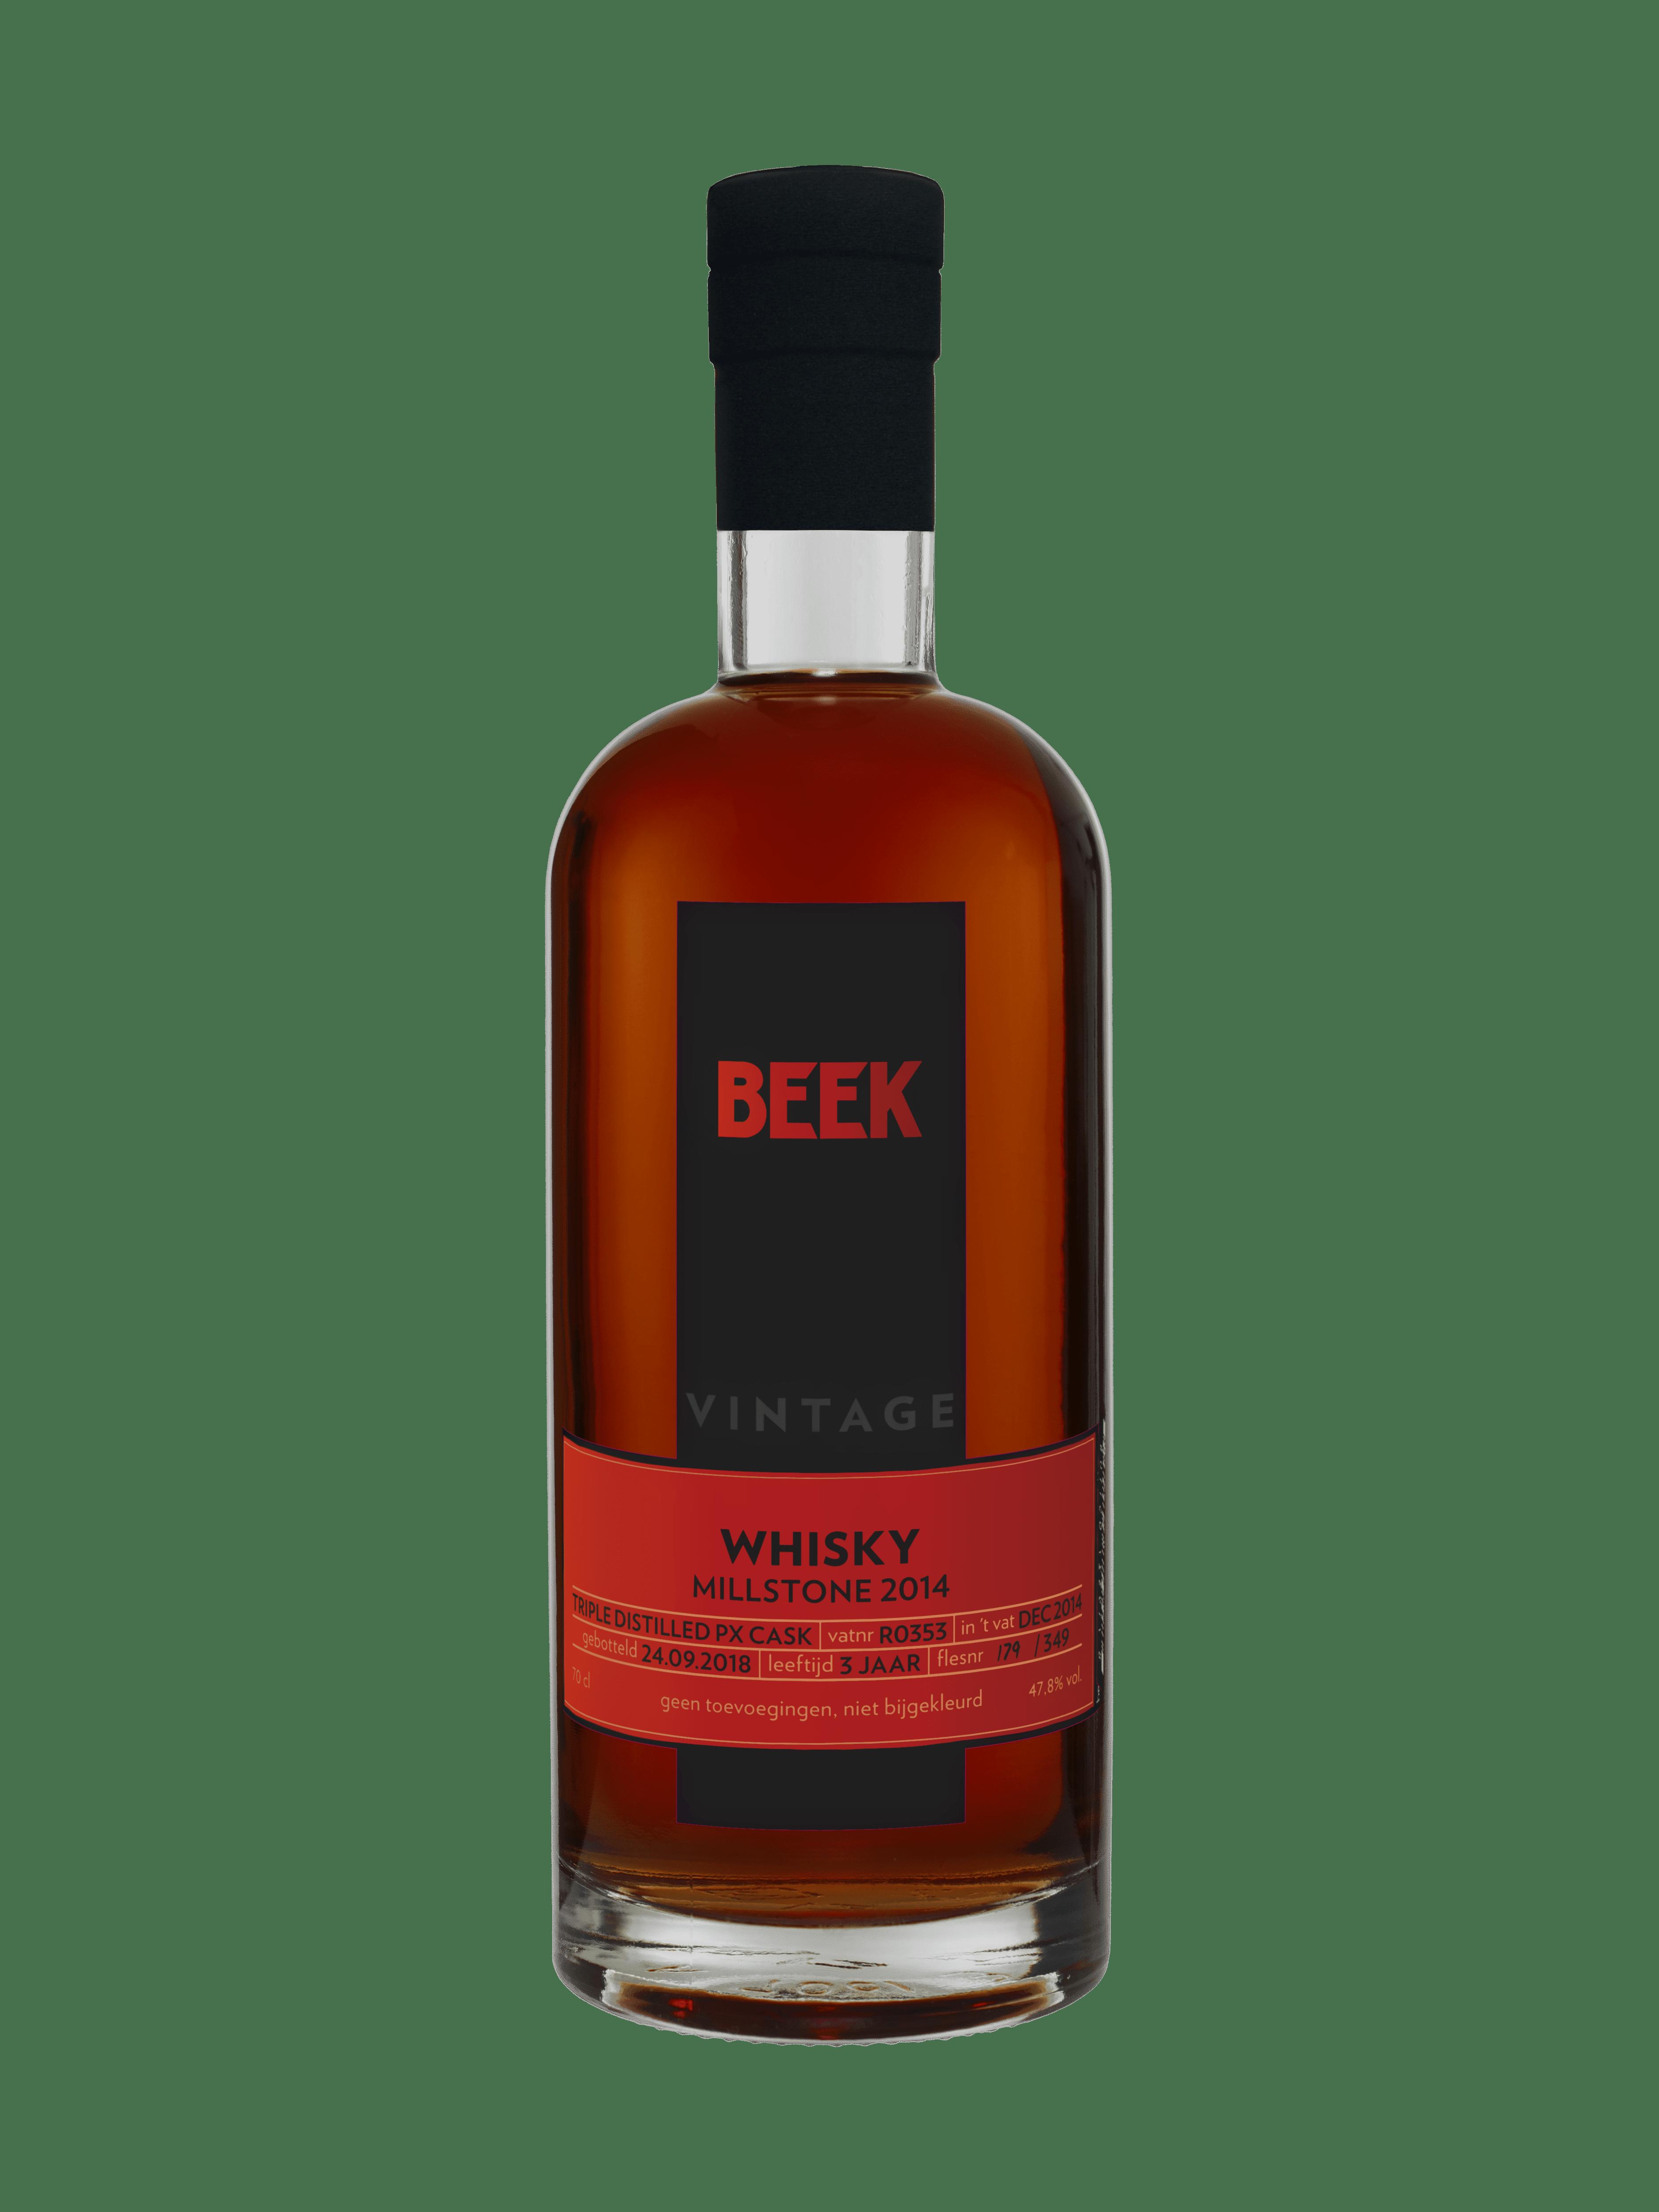 BEEK Vintage Whisky Millstone 2014 Triple Distilled PX